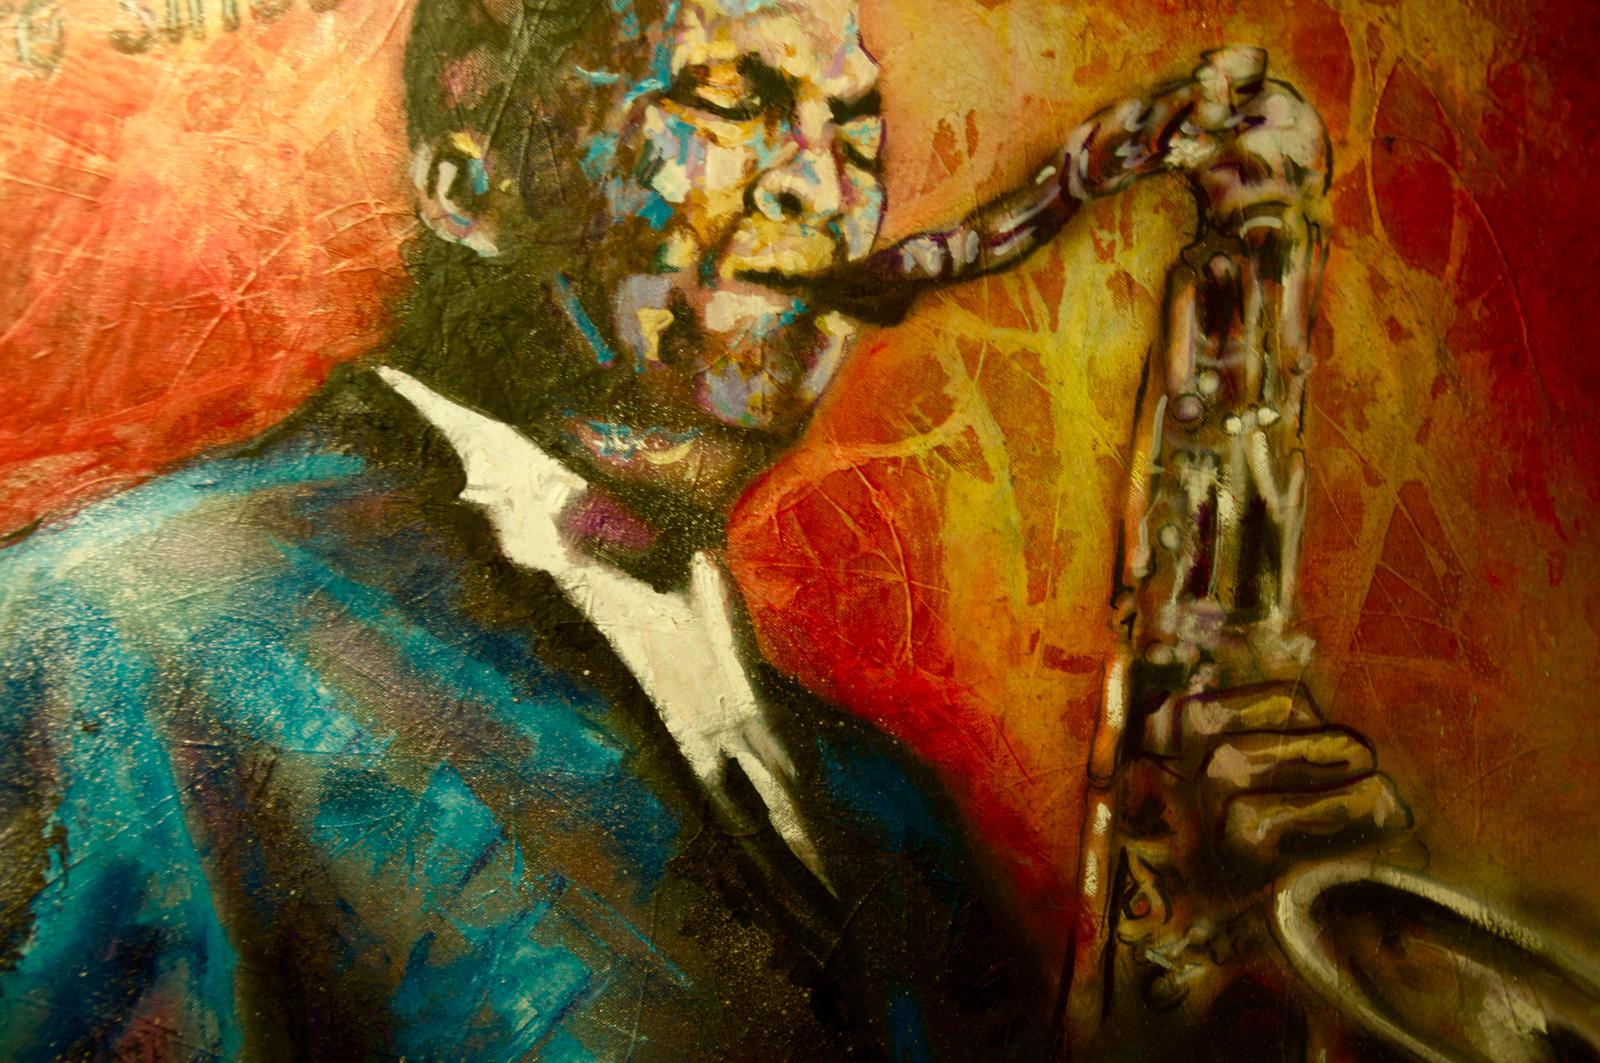 Jazz Fantasia by Michaeldavitt